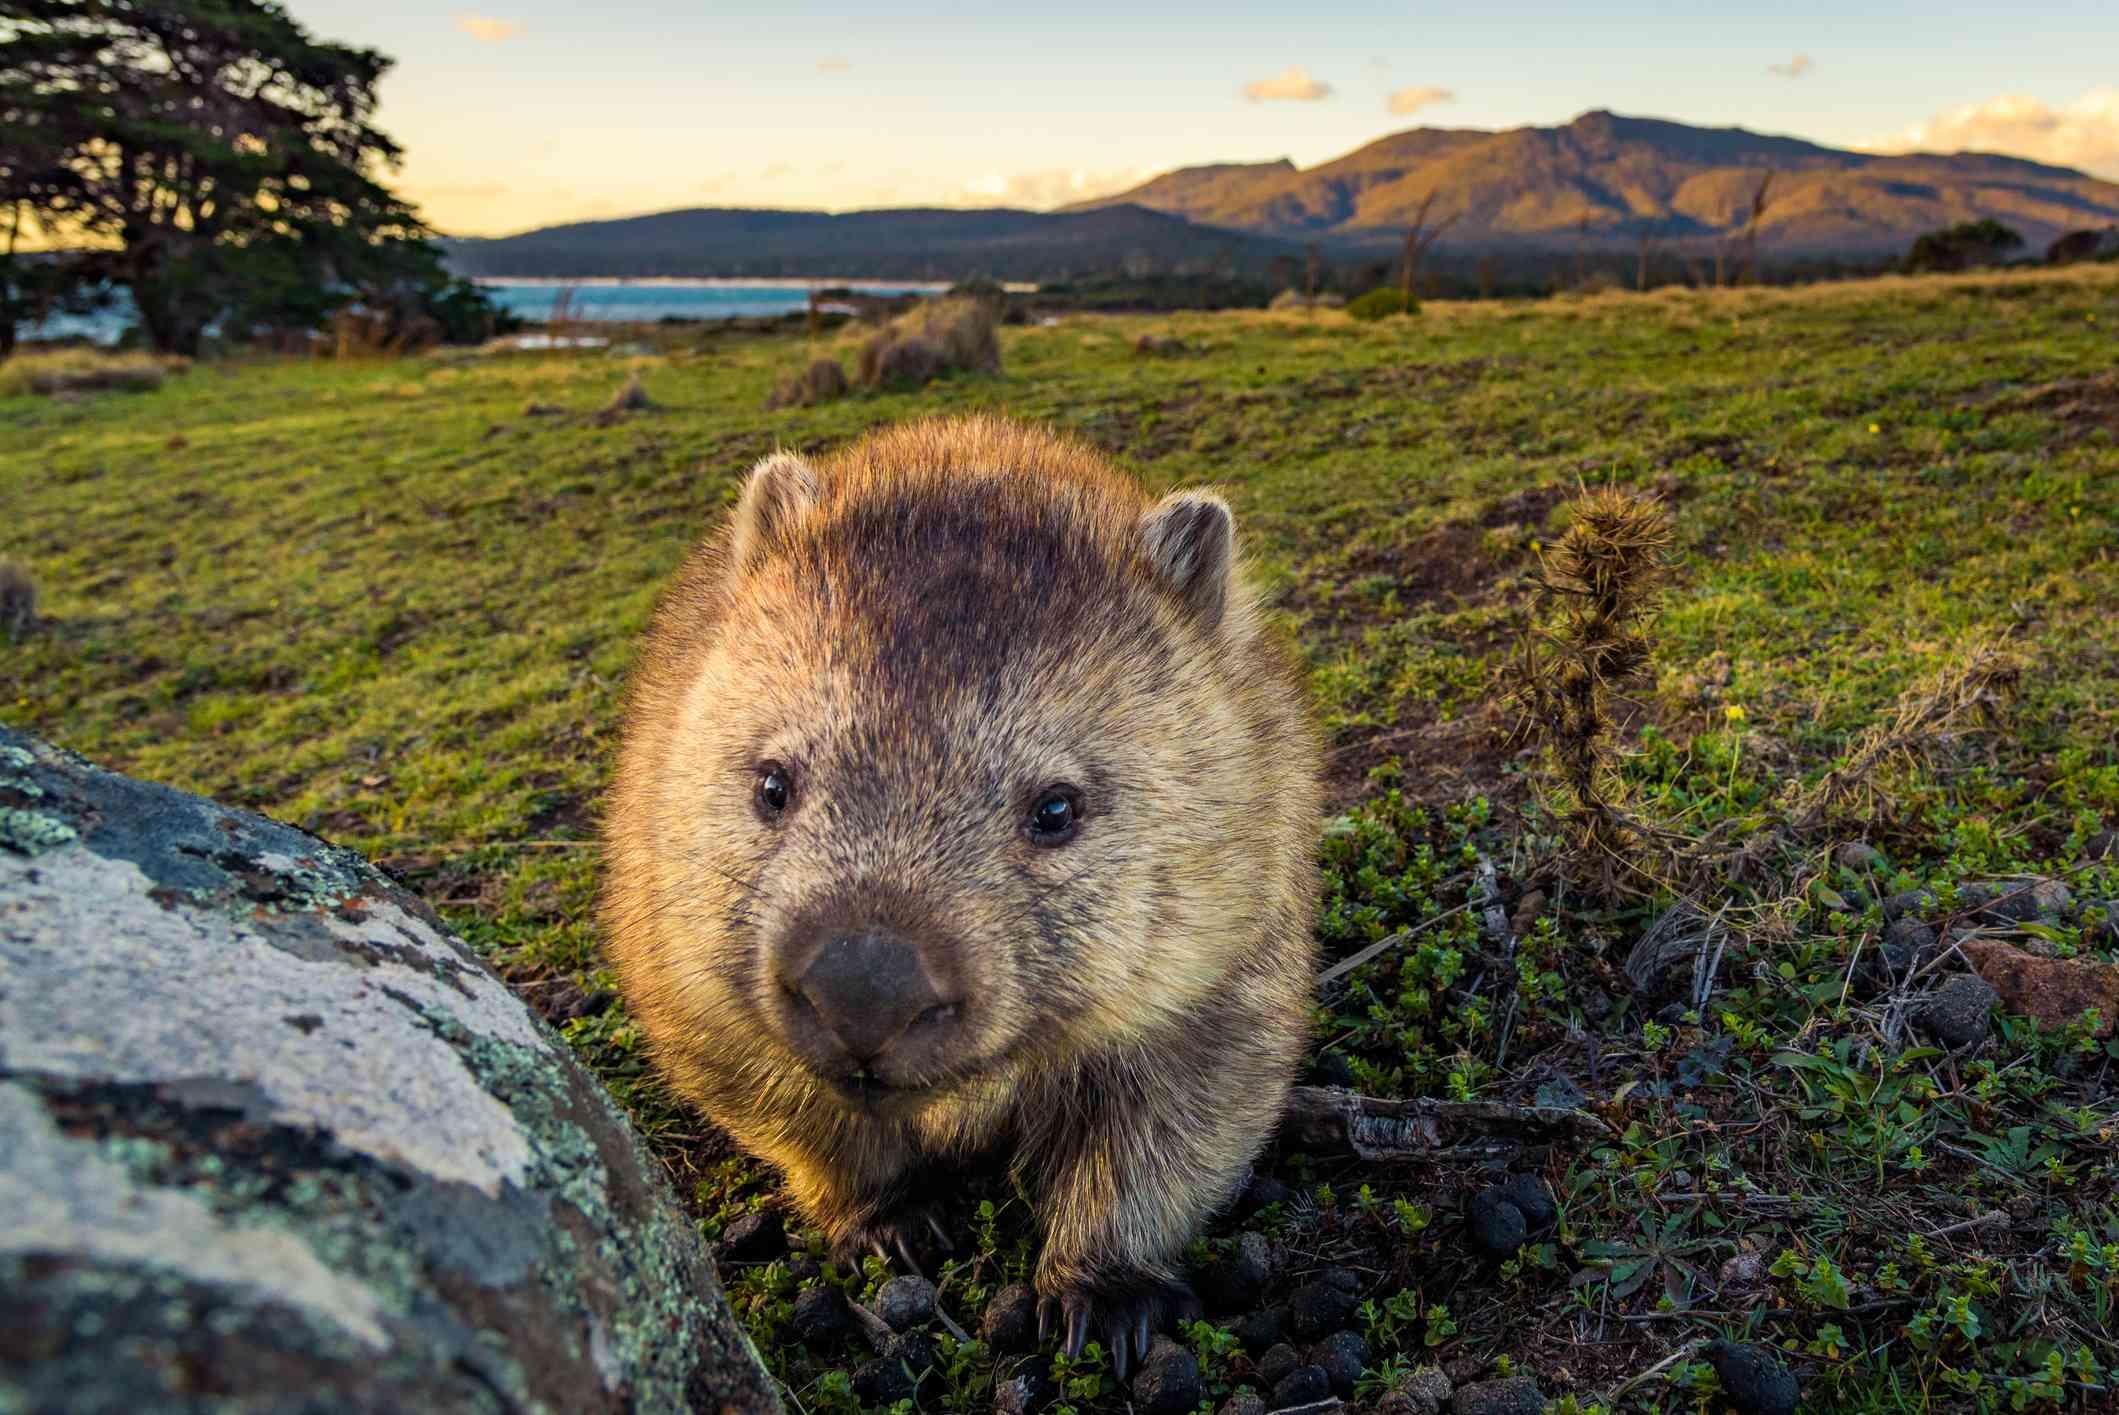 Close up of wombat next to rock